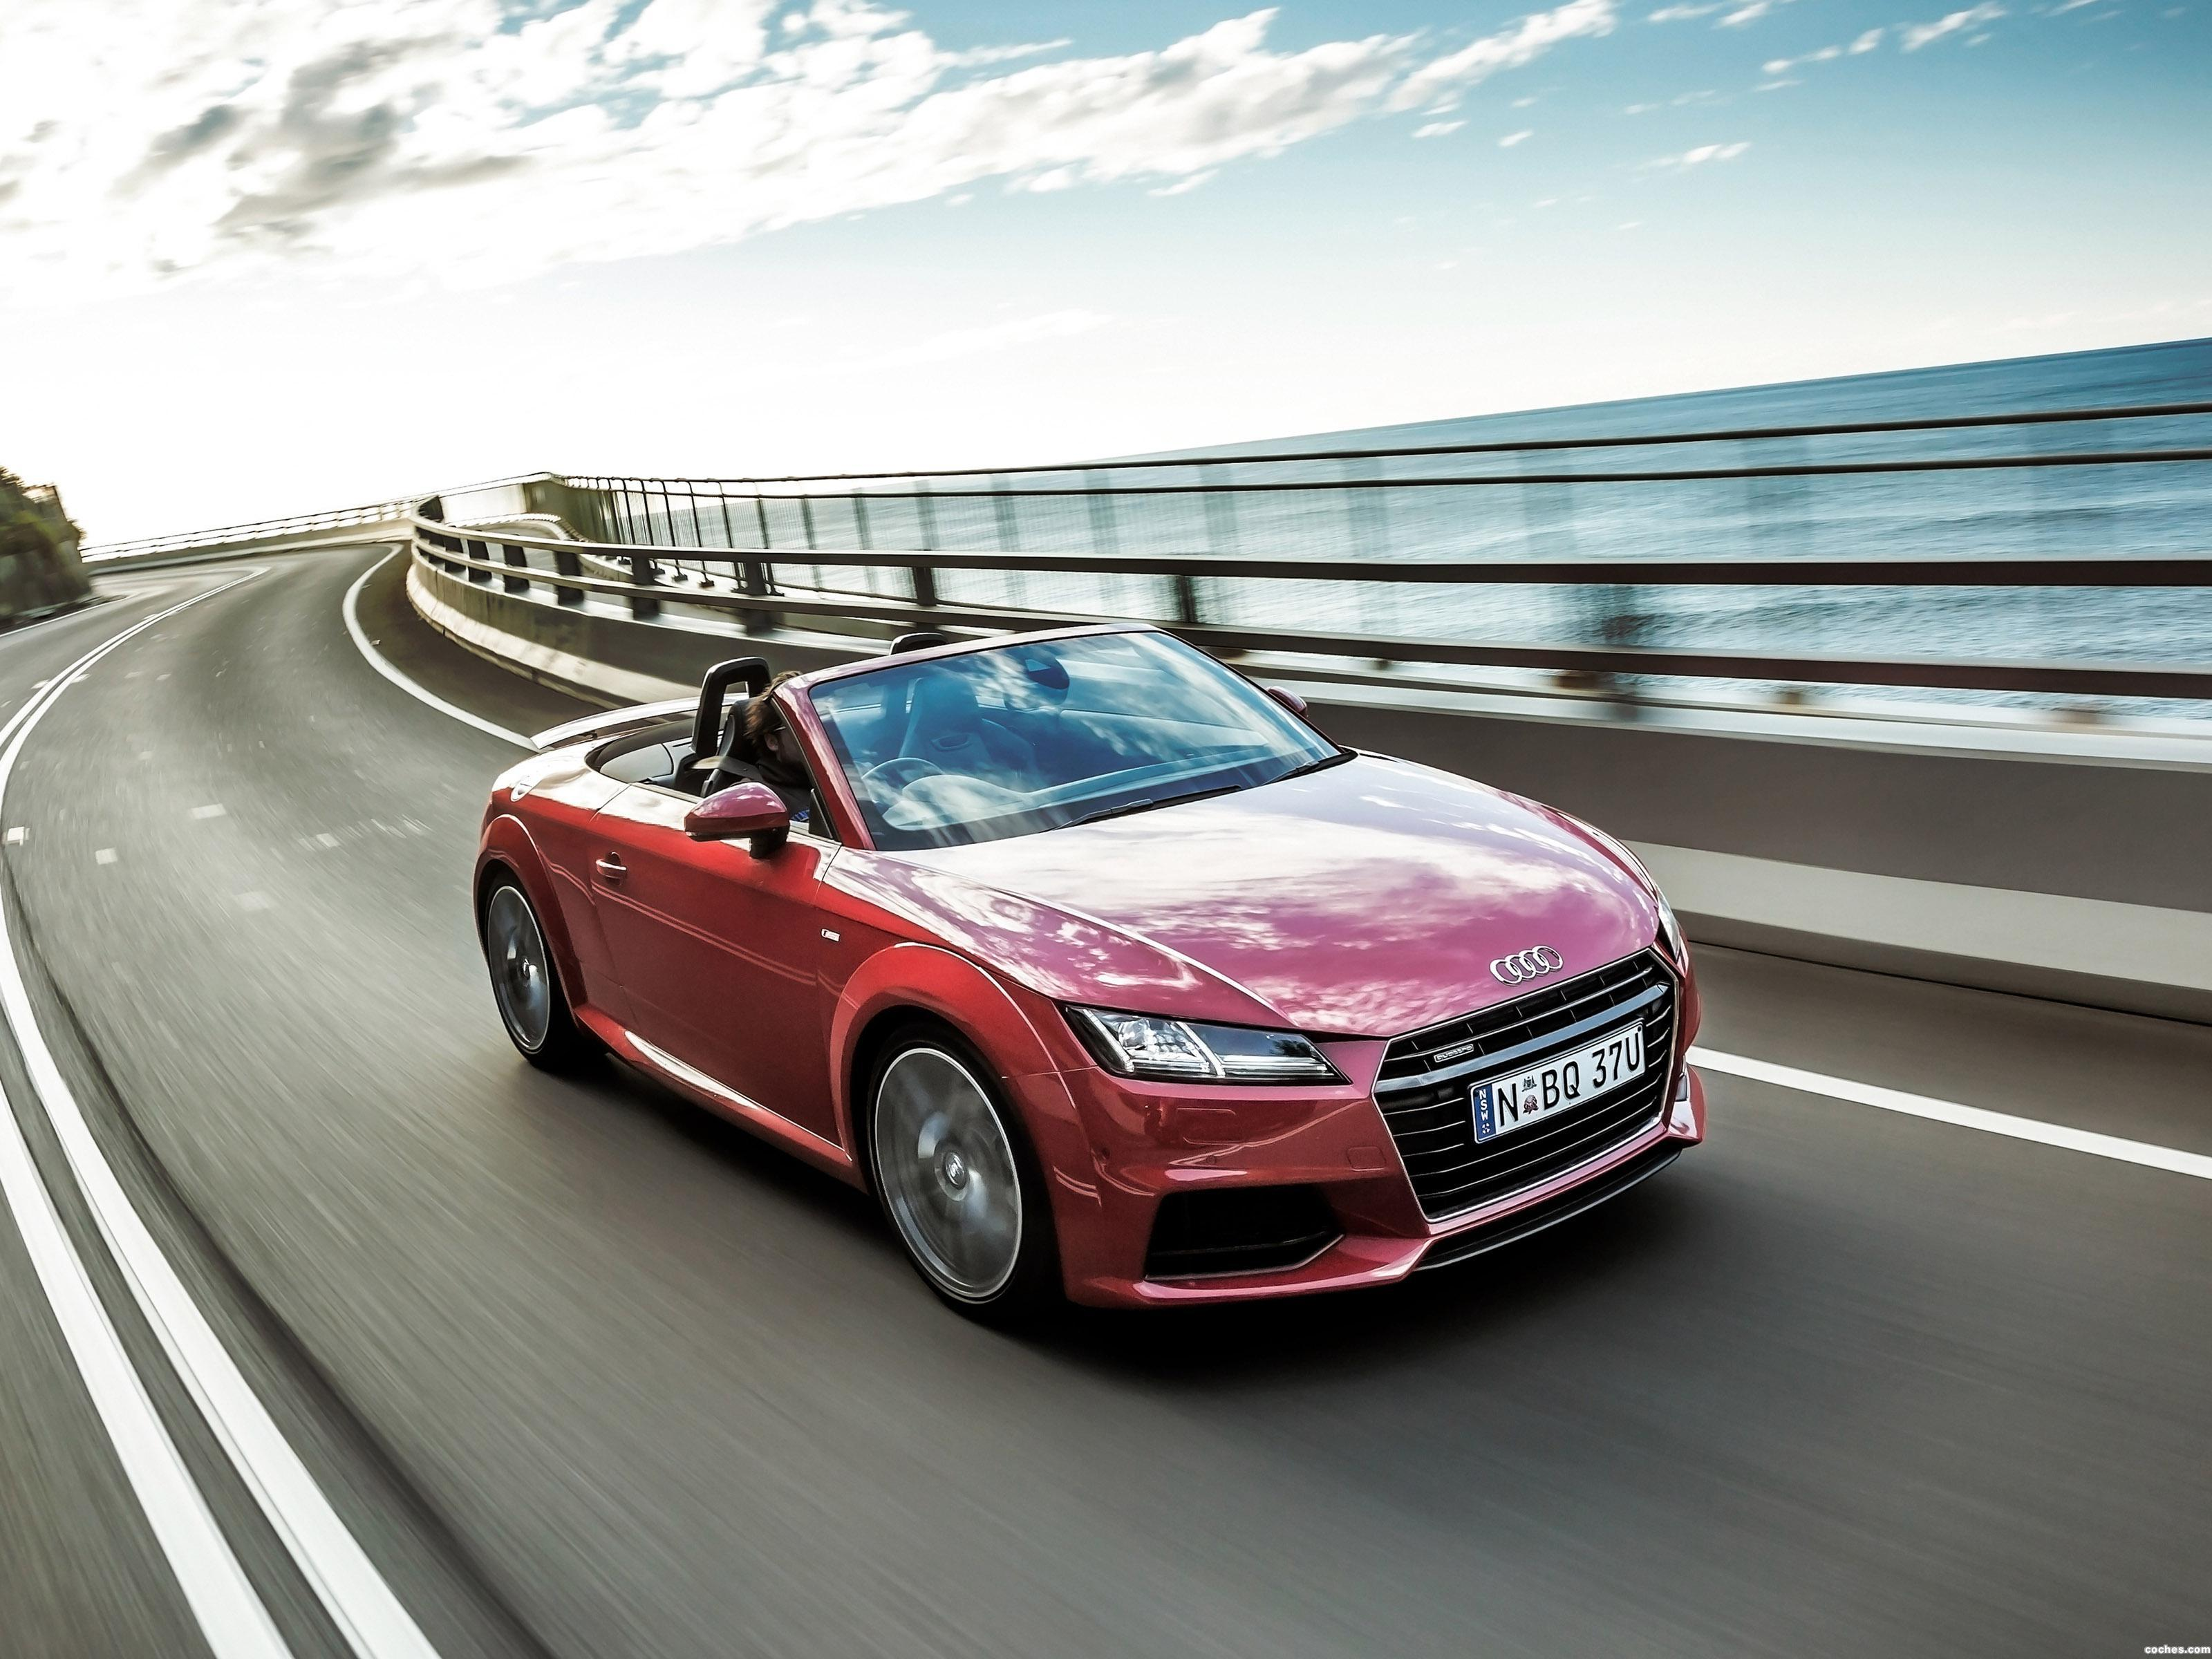 audi_tt-roadster-2-0-tfsi-quattro-s-line-australia-2015_r30.jpg